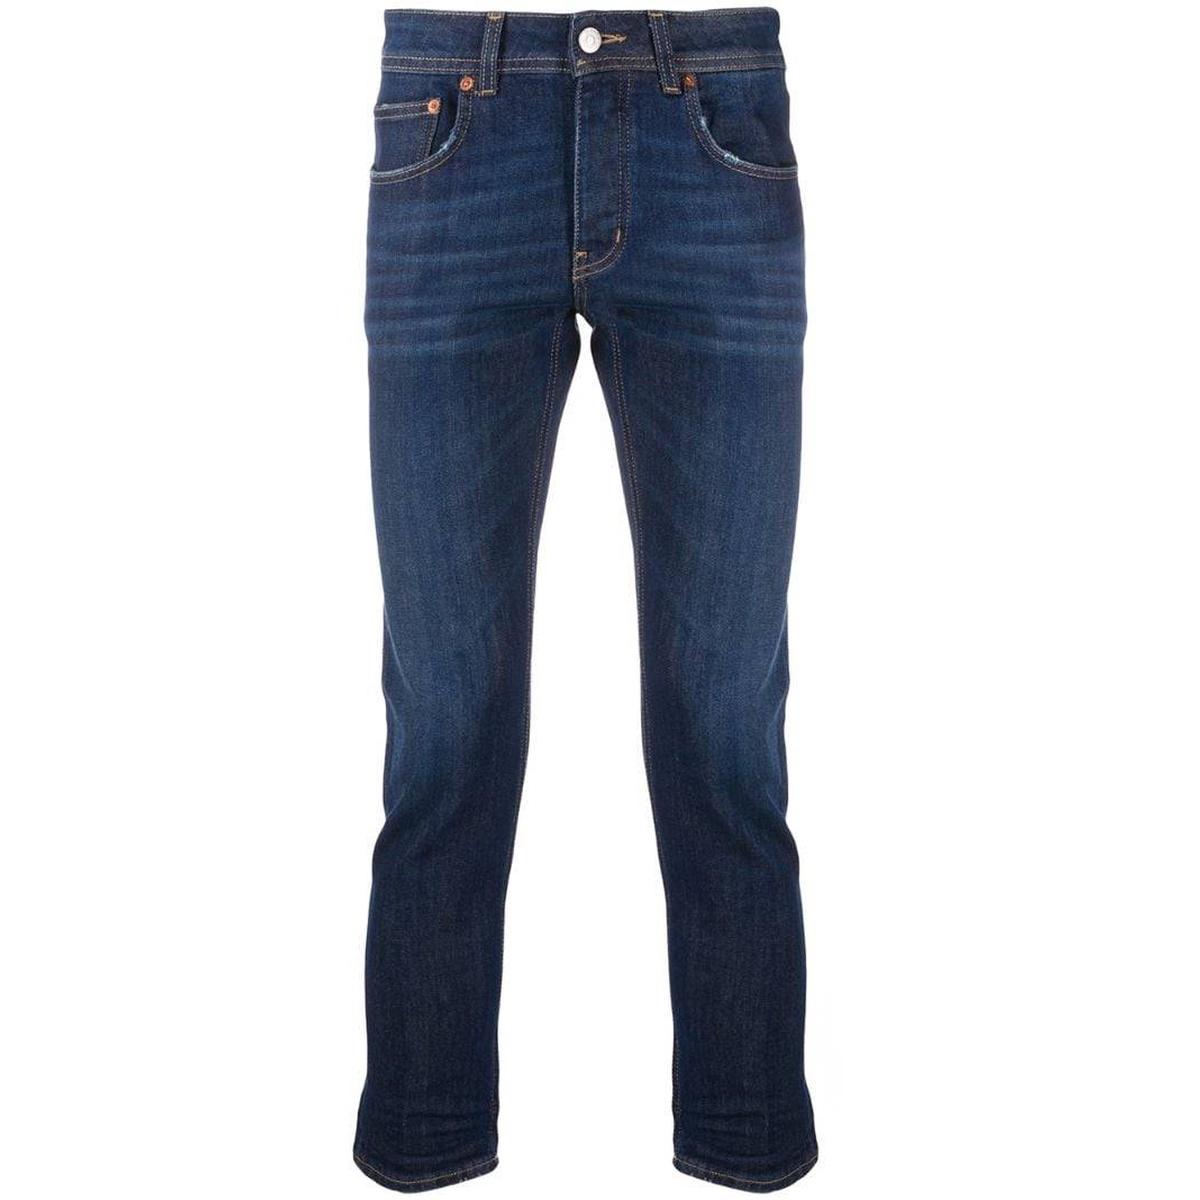 Buy haikure skinny ankle revealing jeans 2021 new luxury pants simple imitation old fashion versatile